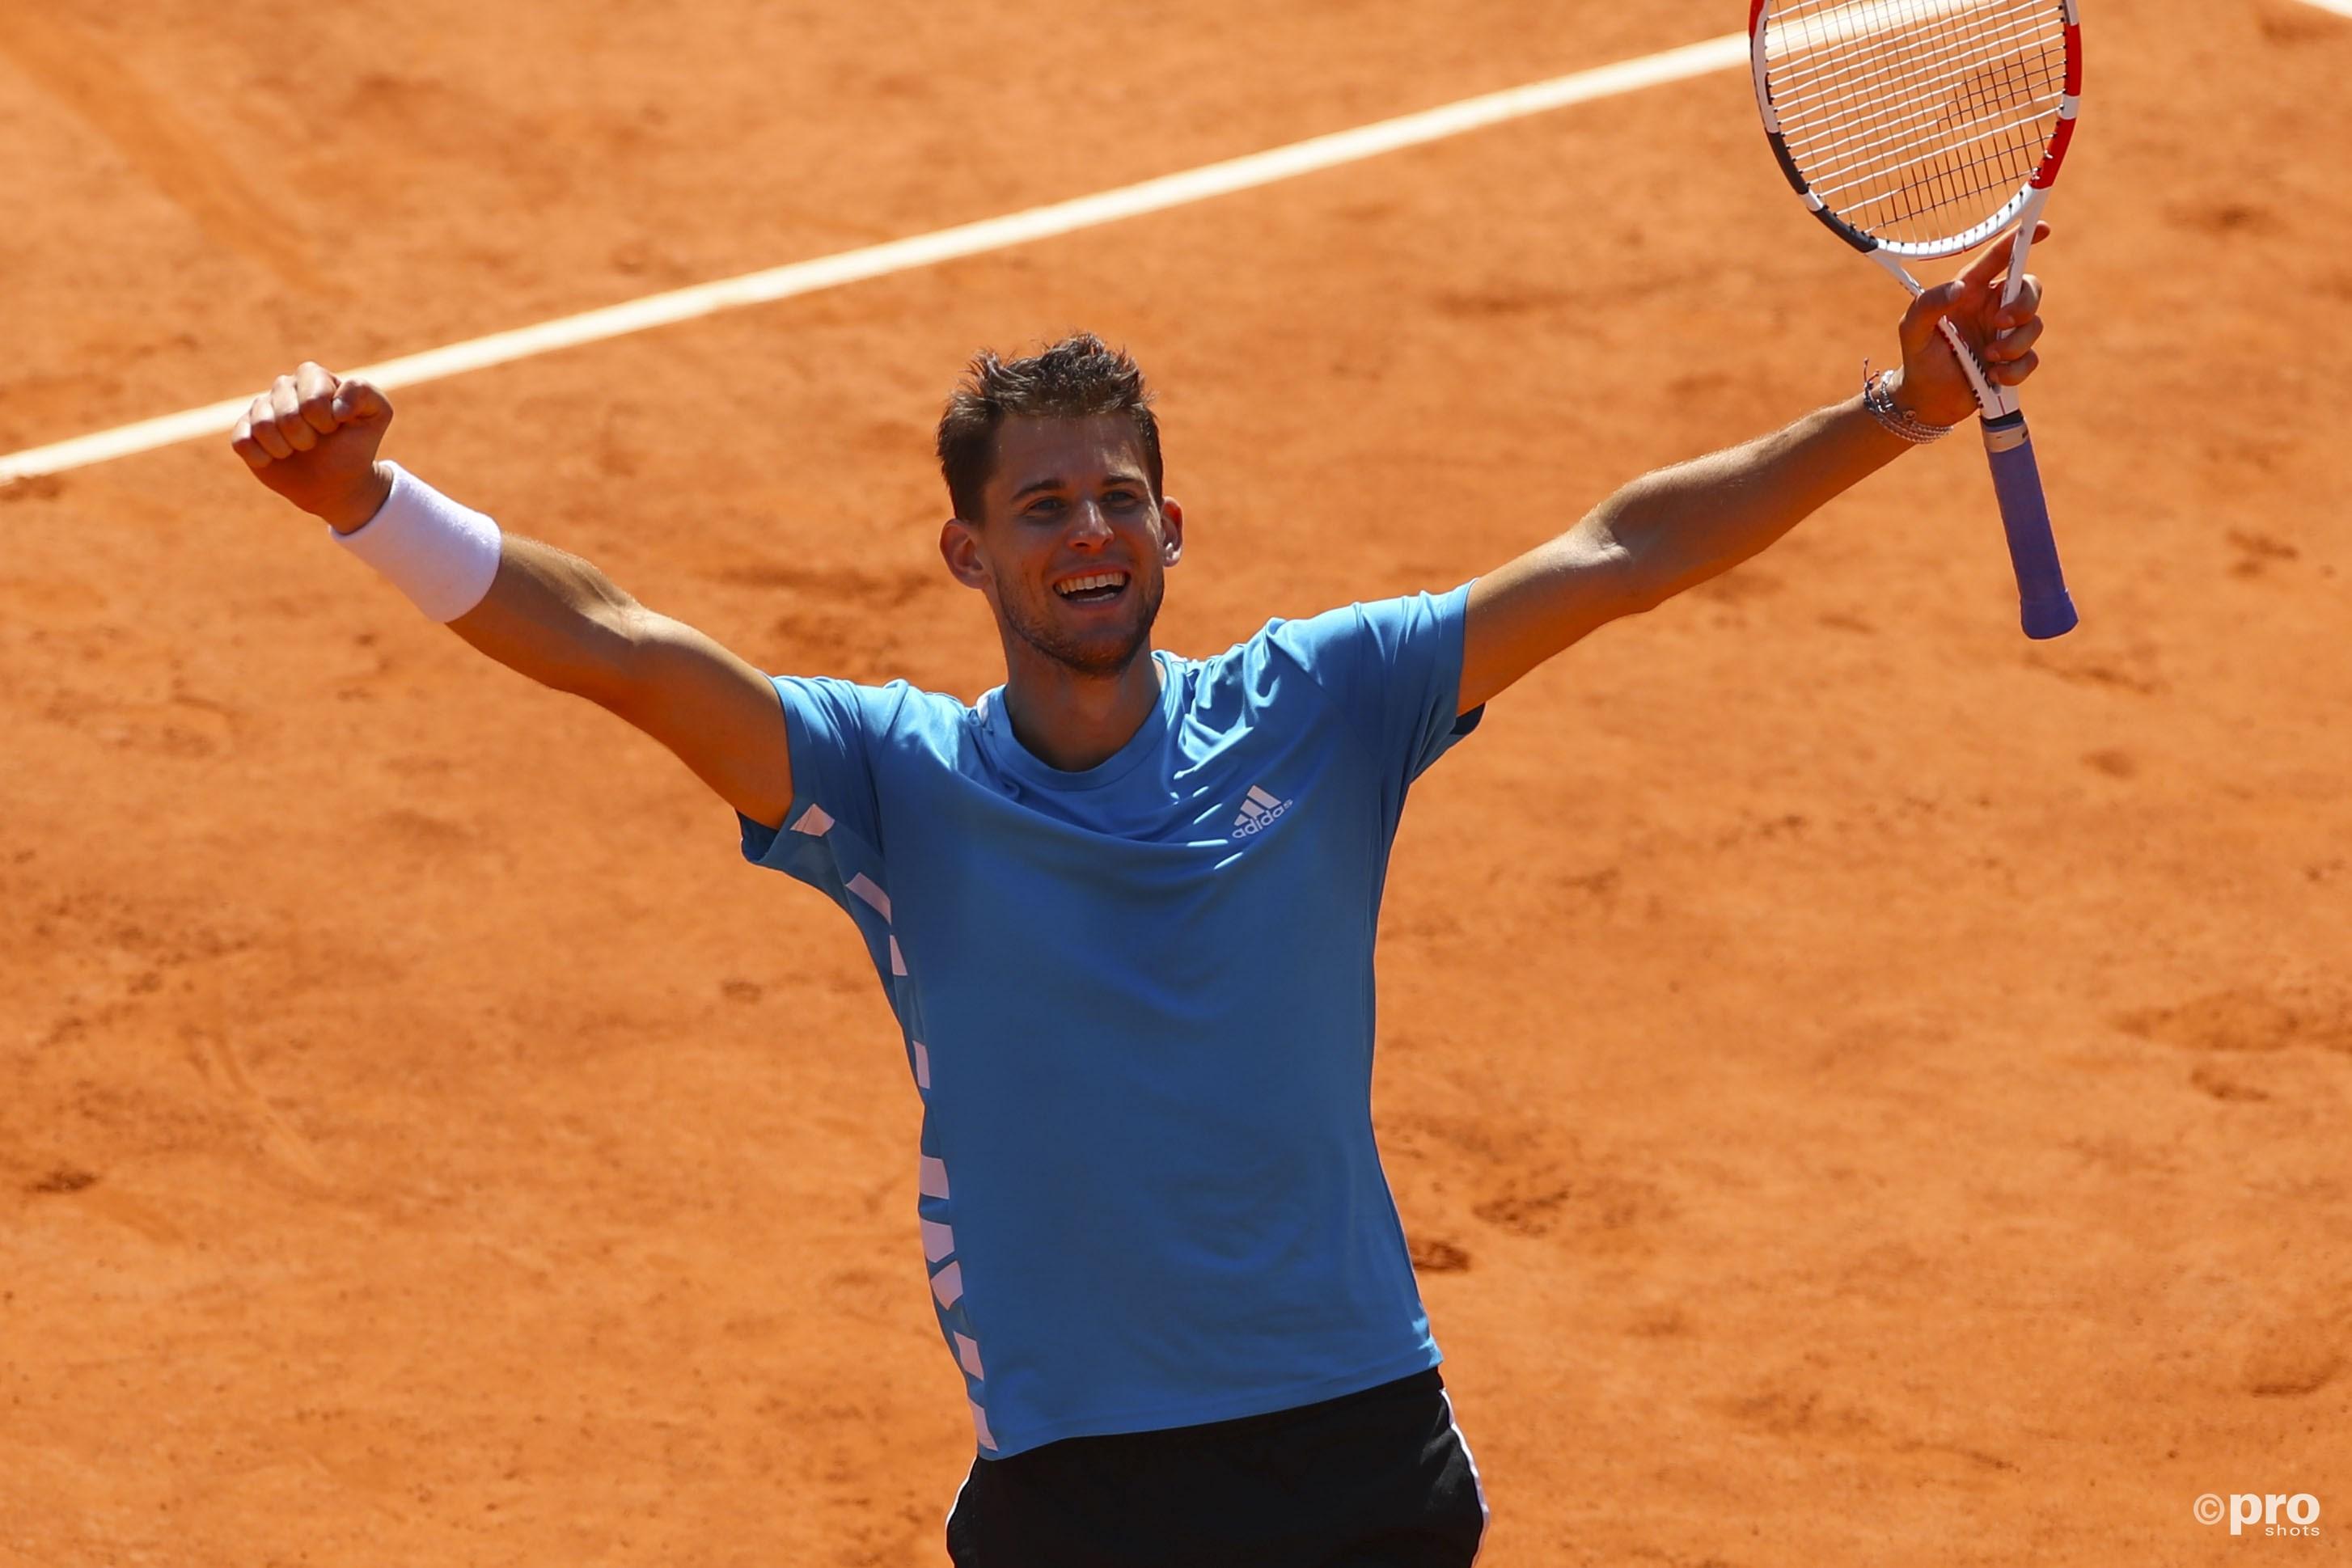 Thiem verslaat Djokovic na spannende vijfsetter en speelt finale Roland Garros opnieuw tegen Nadal (Pro Shots / Panoramic)